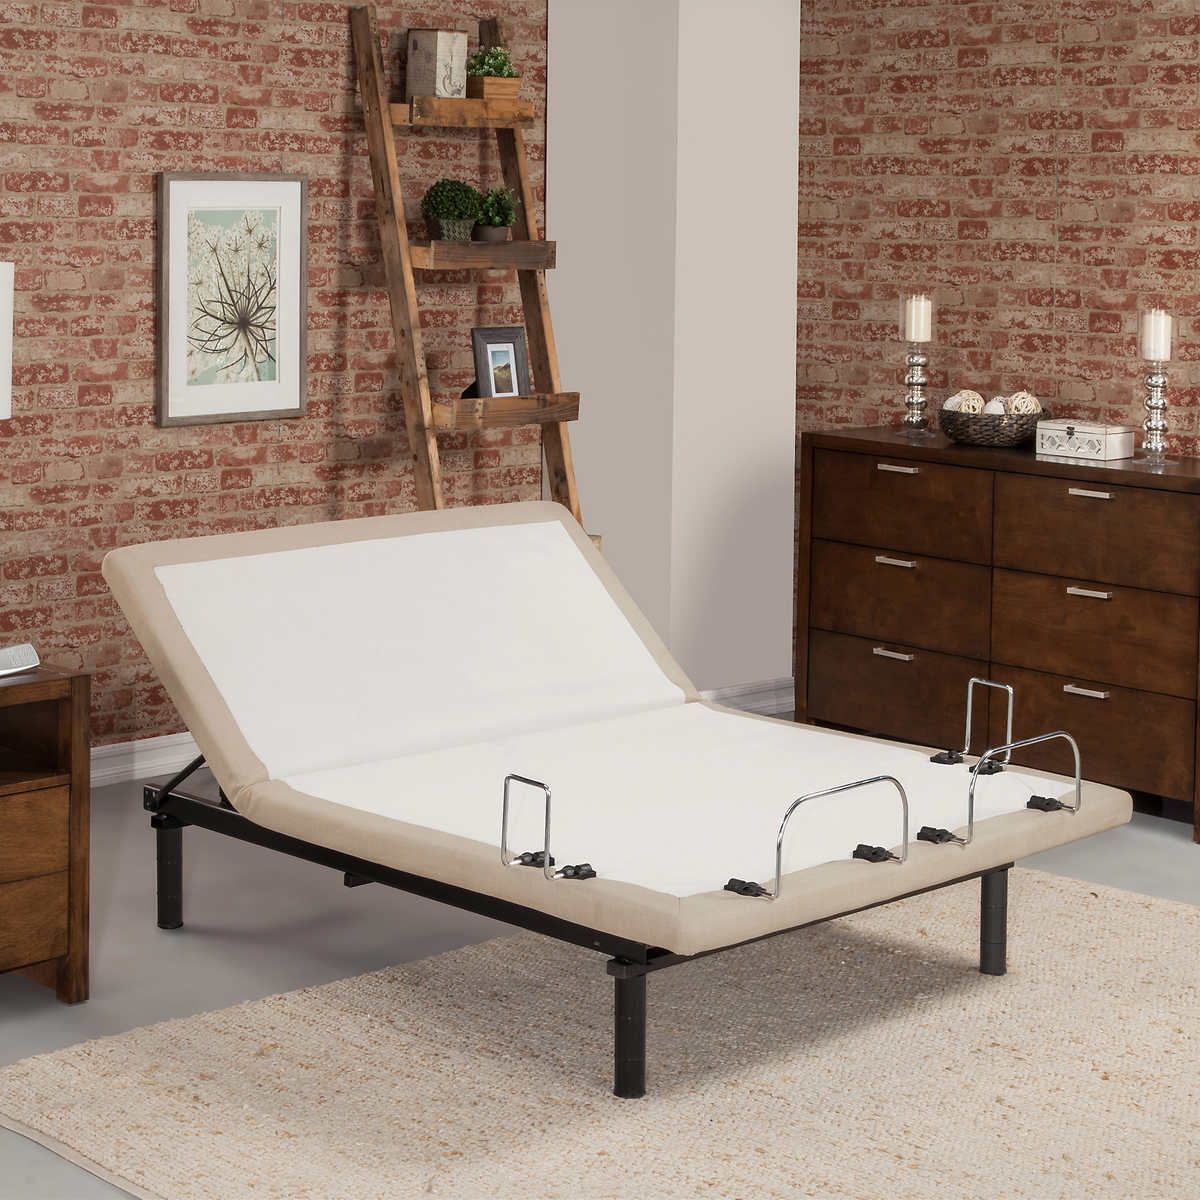 sleep science queen adjustable base - Costco Bed Frames